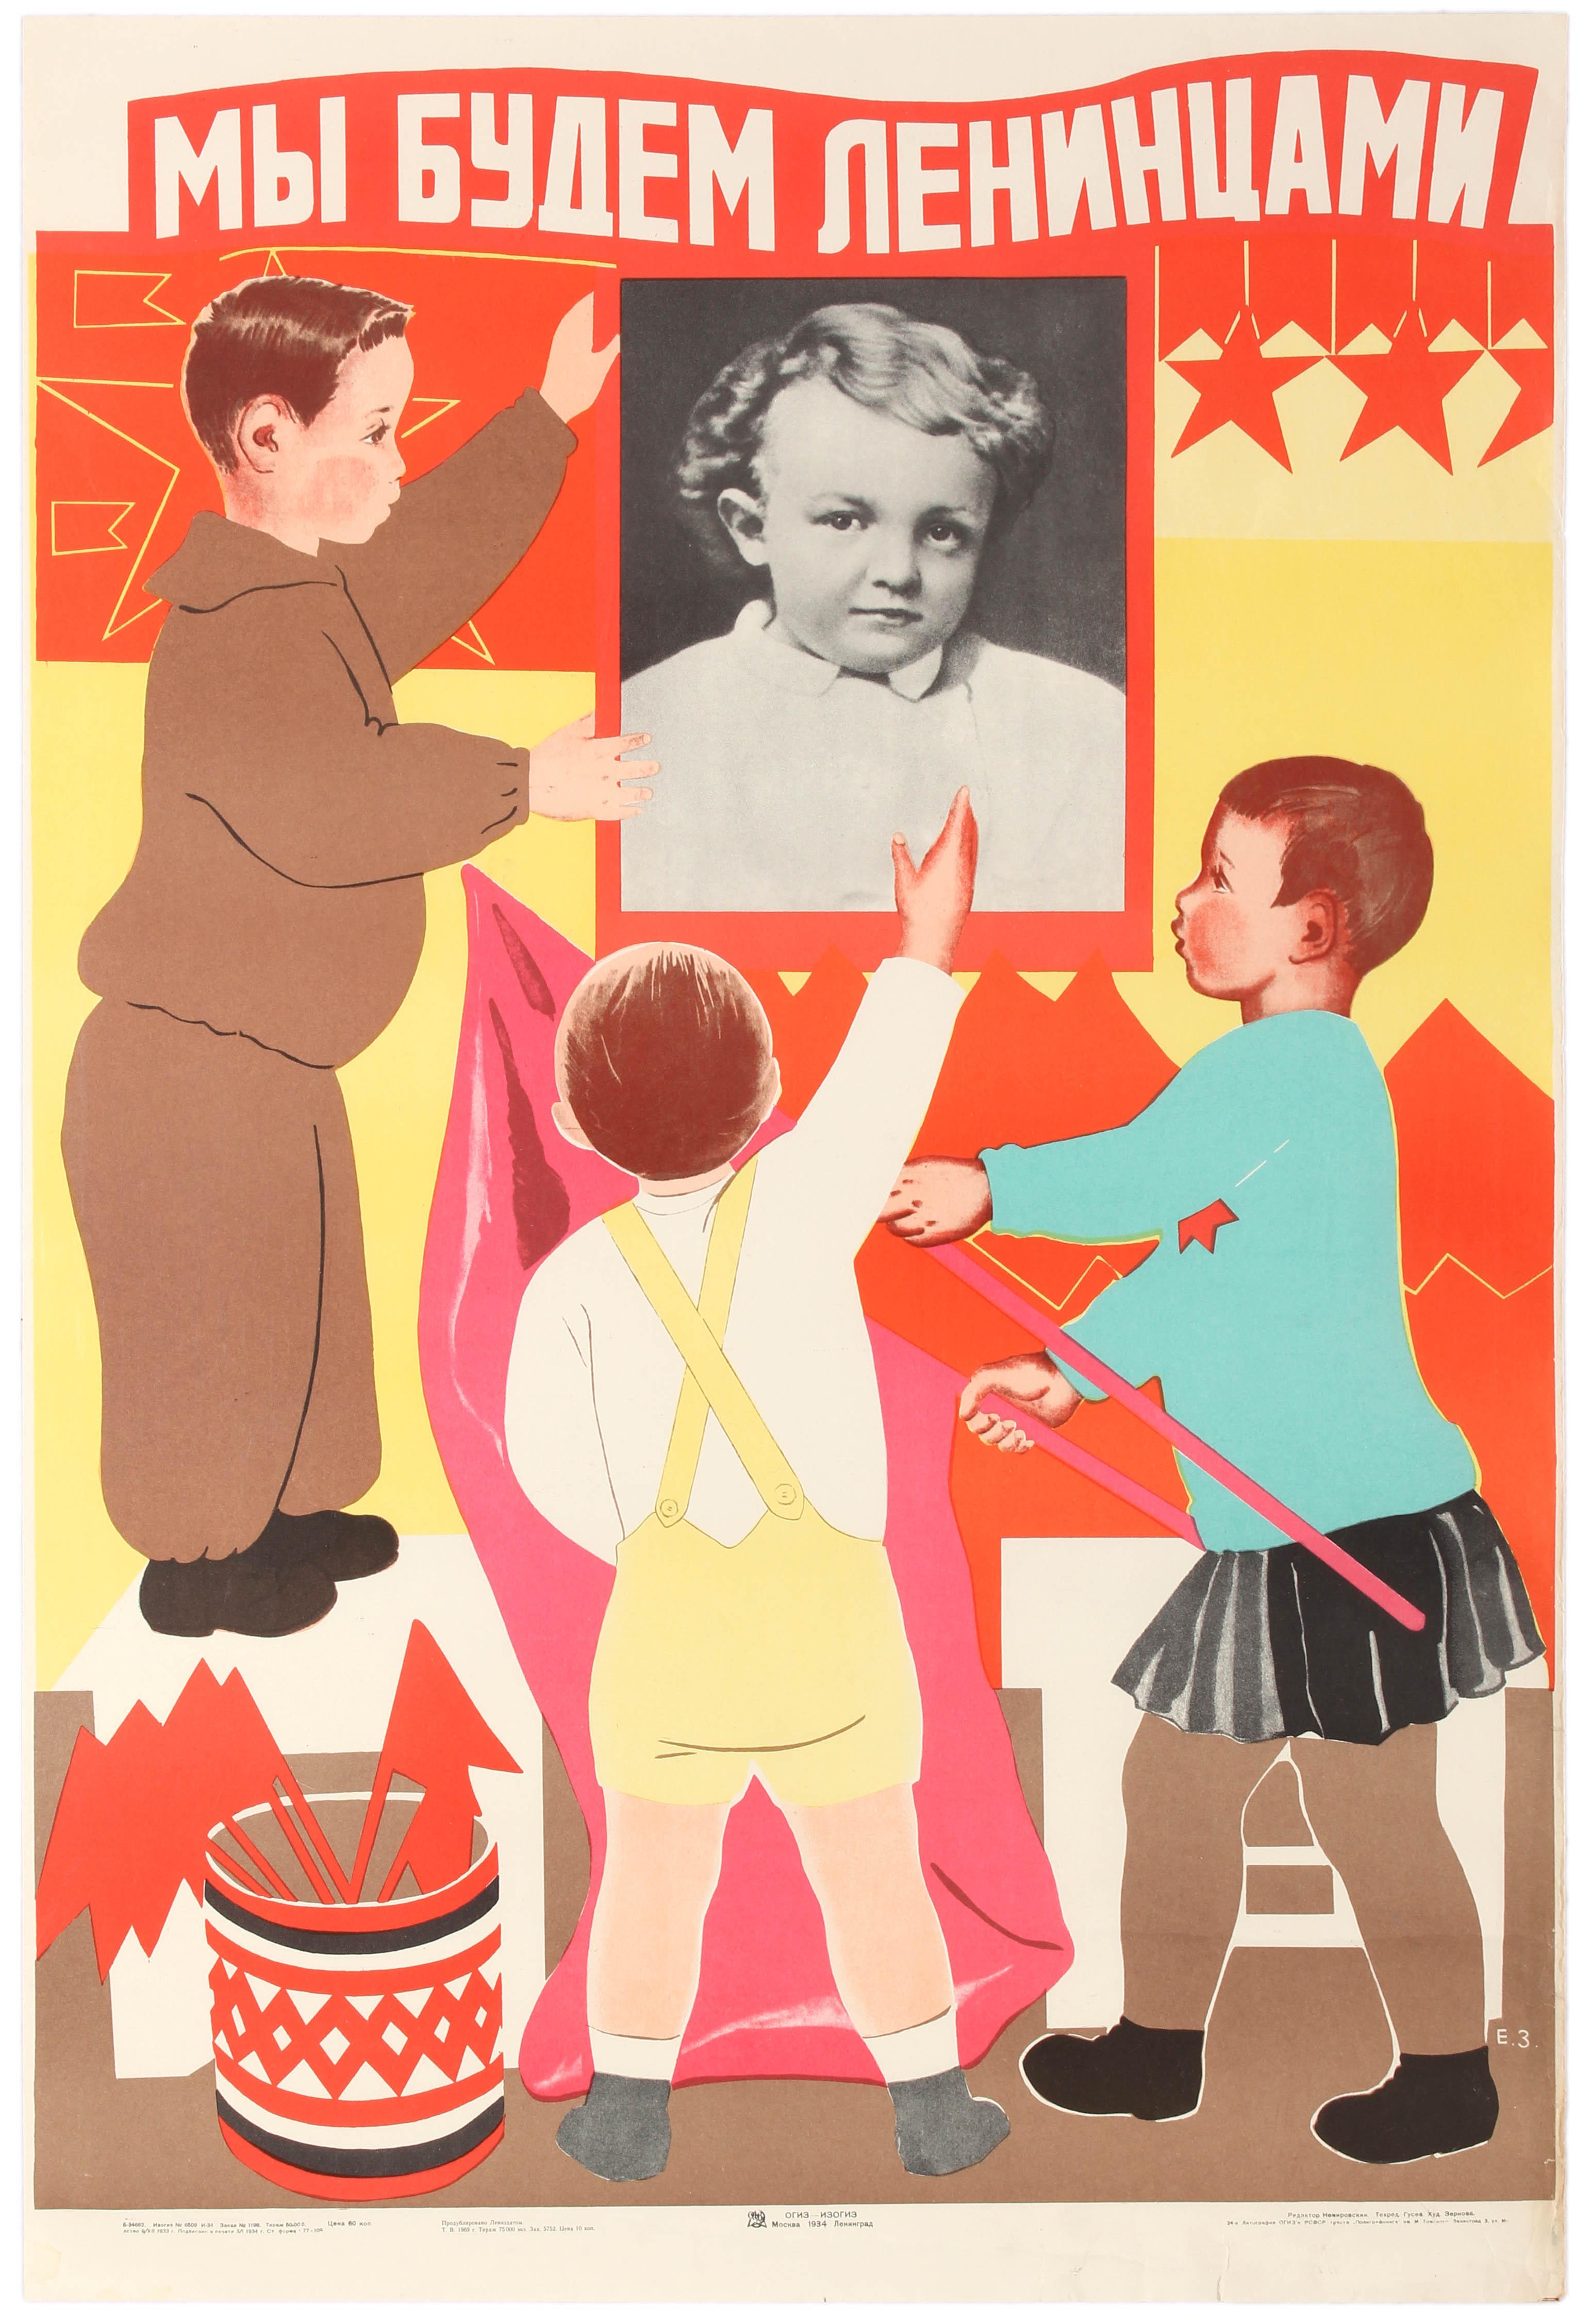 Lot 50 - Set 3 Propaganda Posters USSR Children Youth Communism